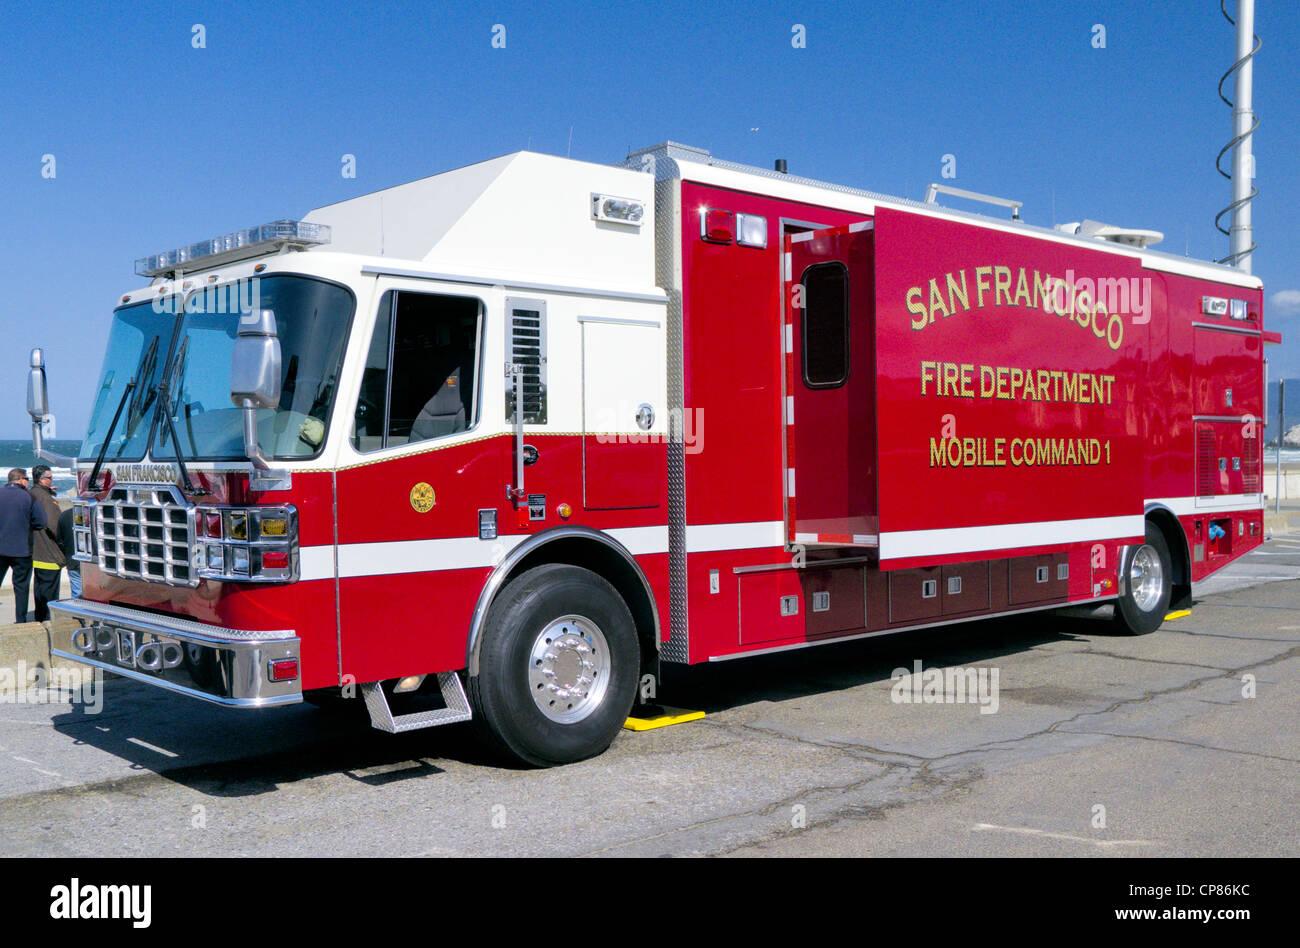 Mobile Emergency Communications San Francisco Fire Dept